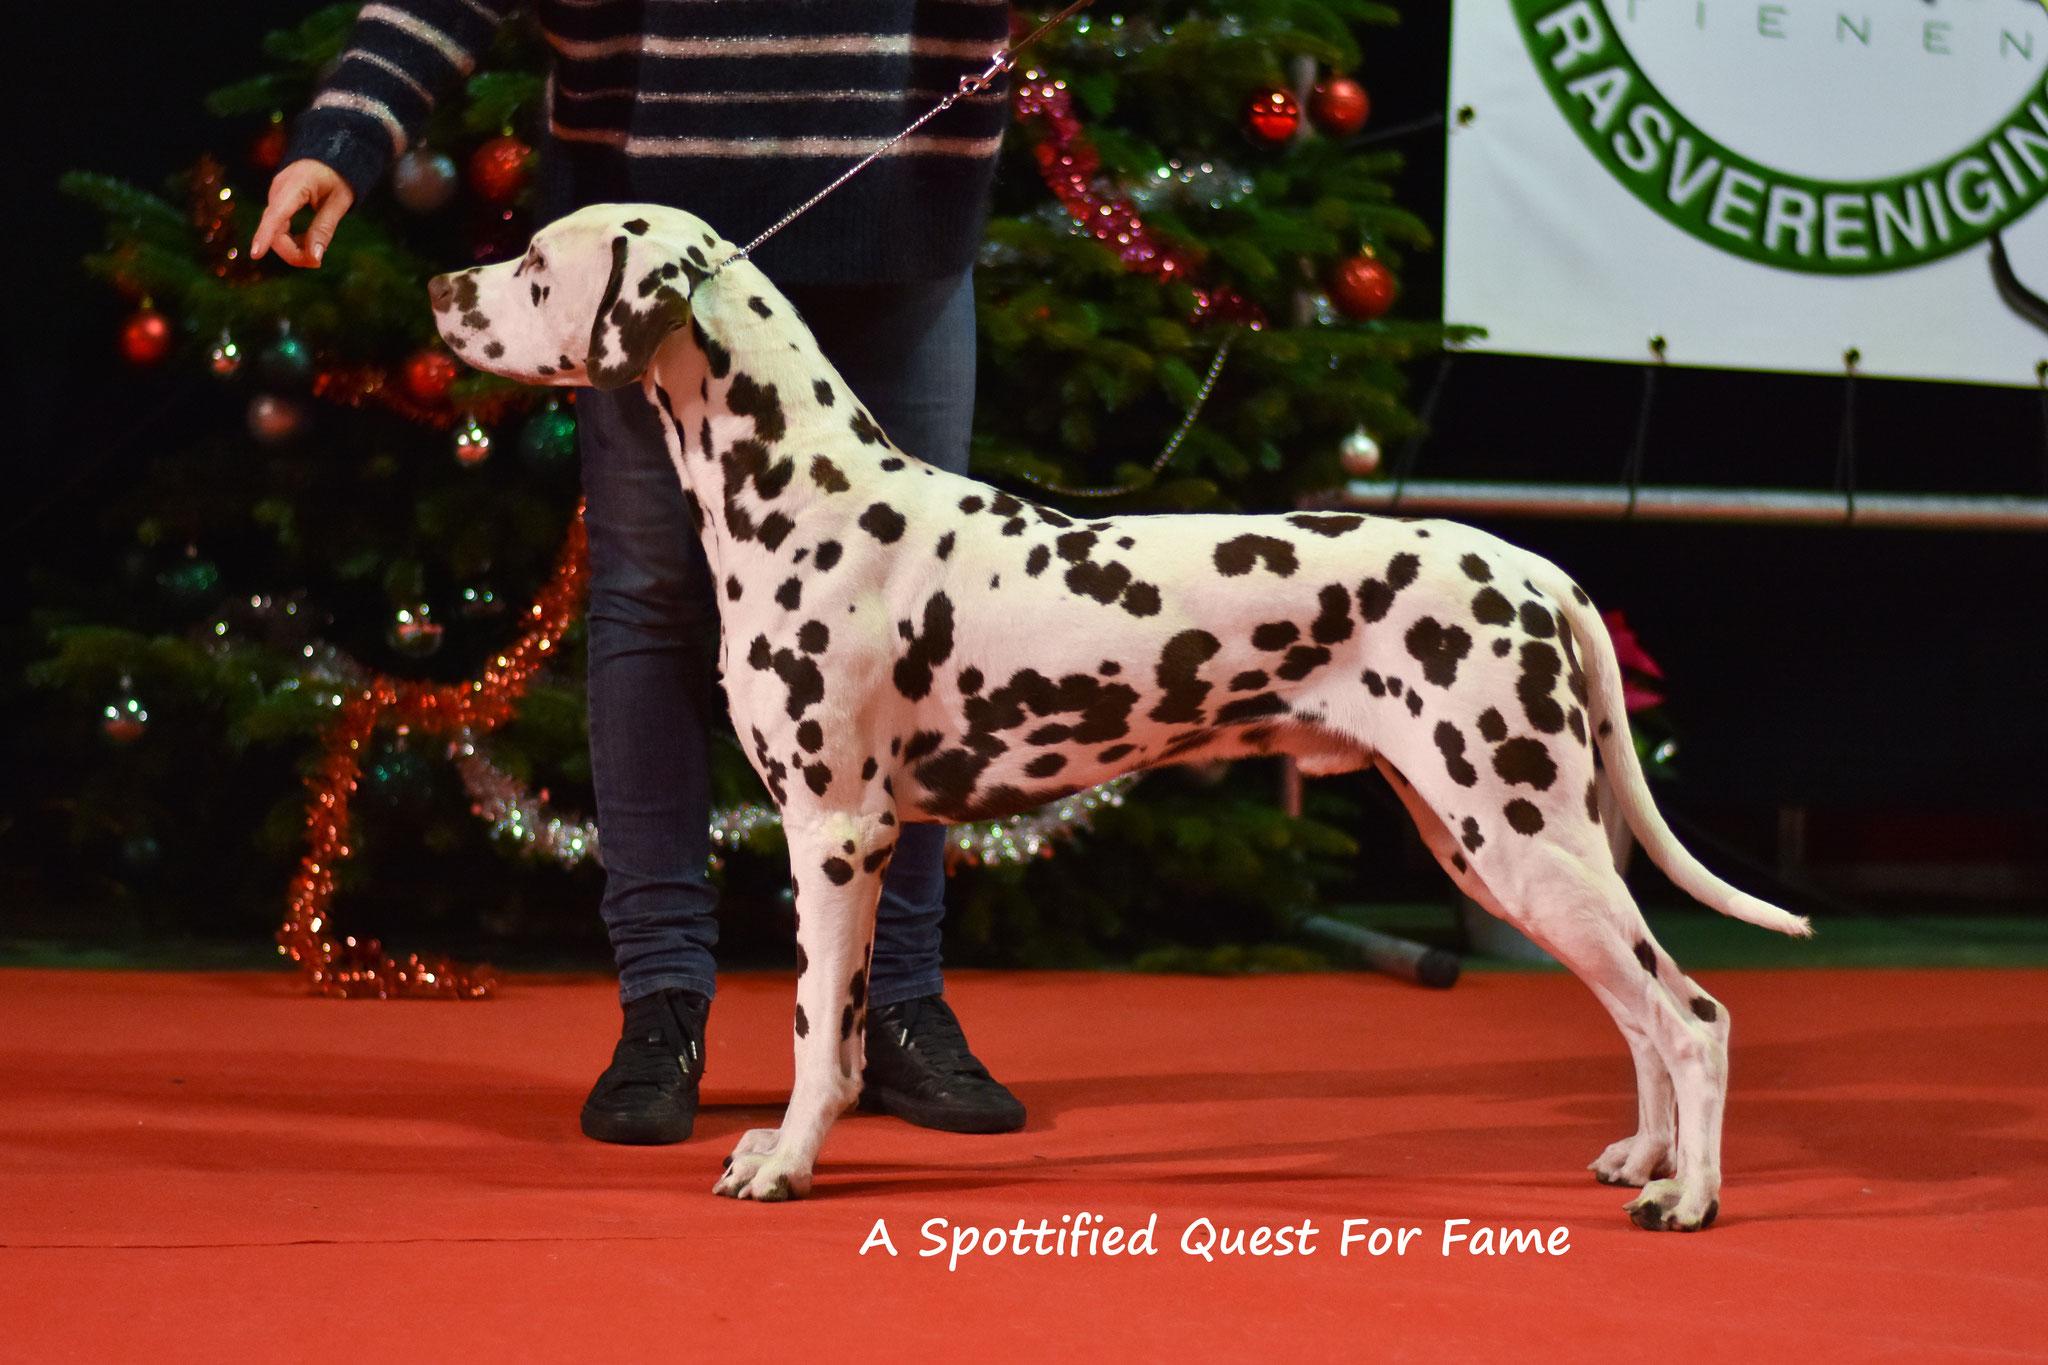 A Spottified Quest For Fame, aka Morris, Landen, 16 months